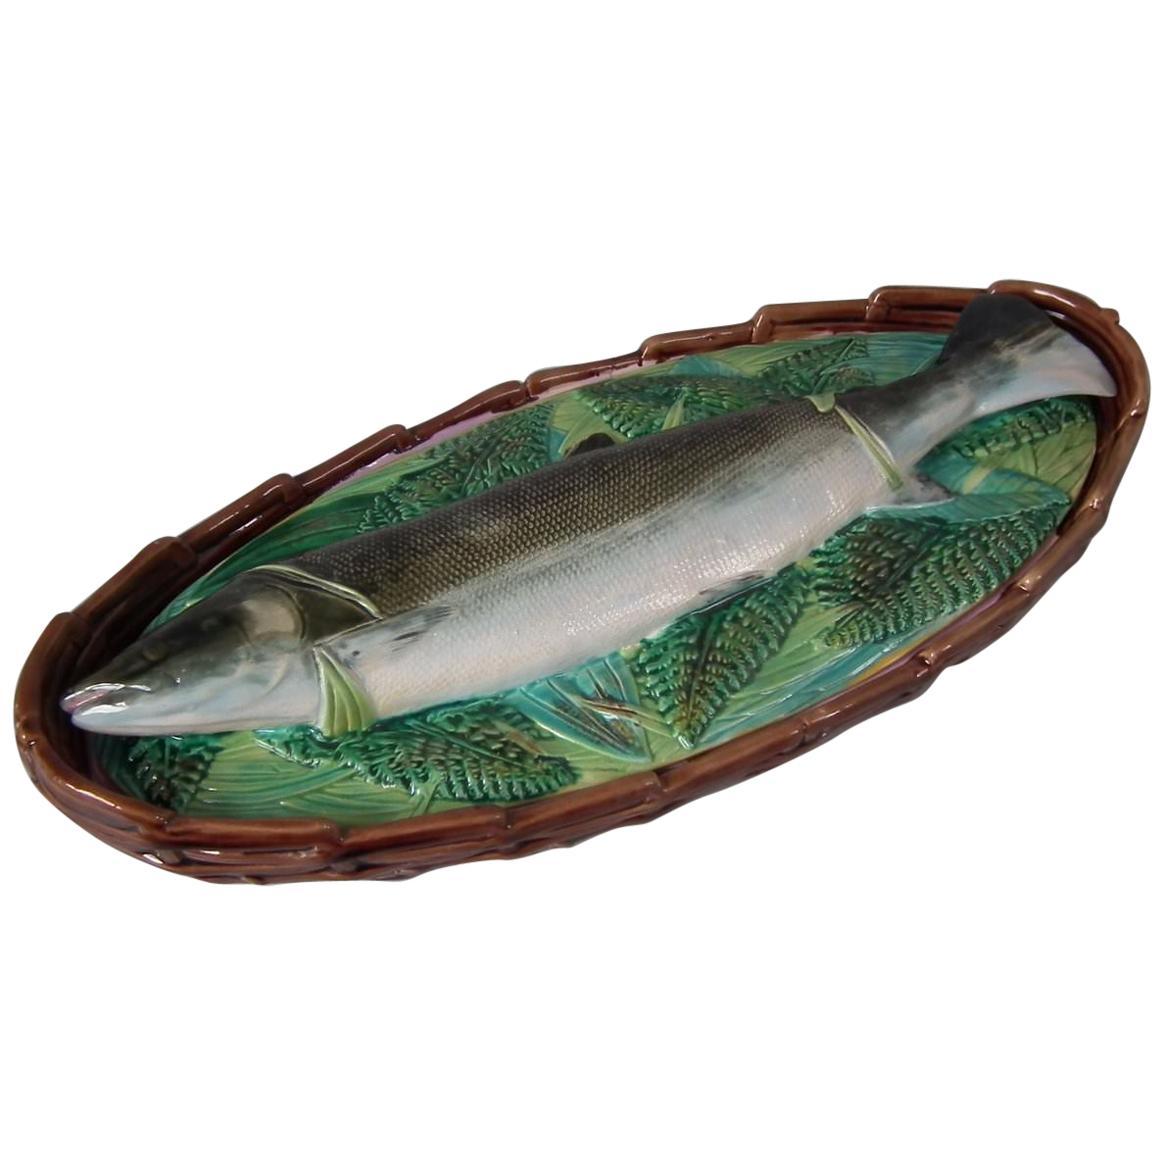 George Jones Majolica Salmon Tureen